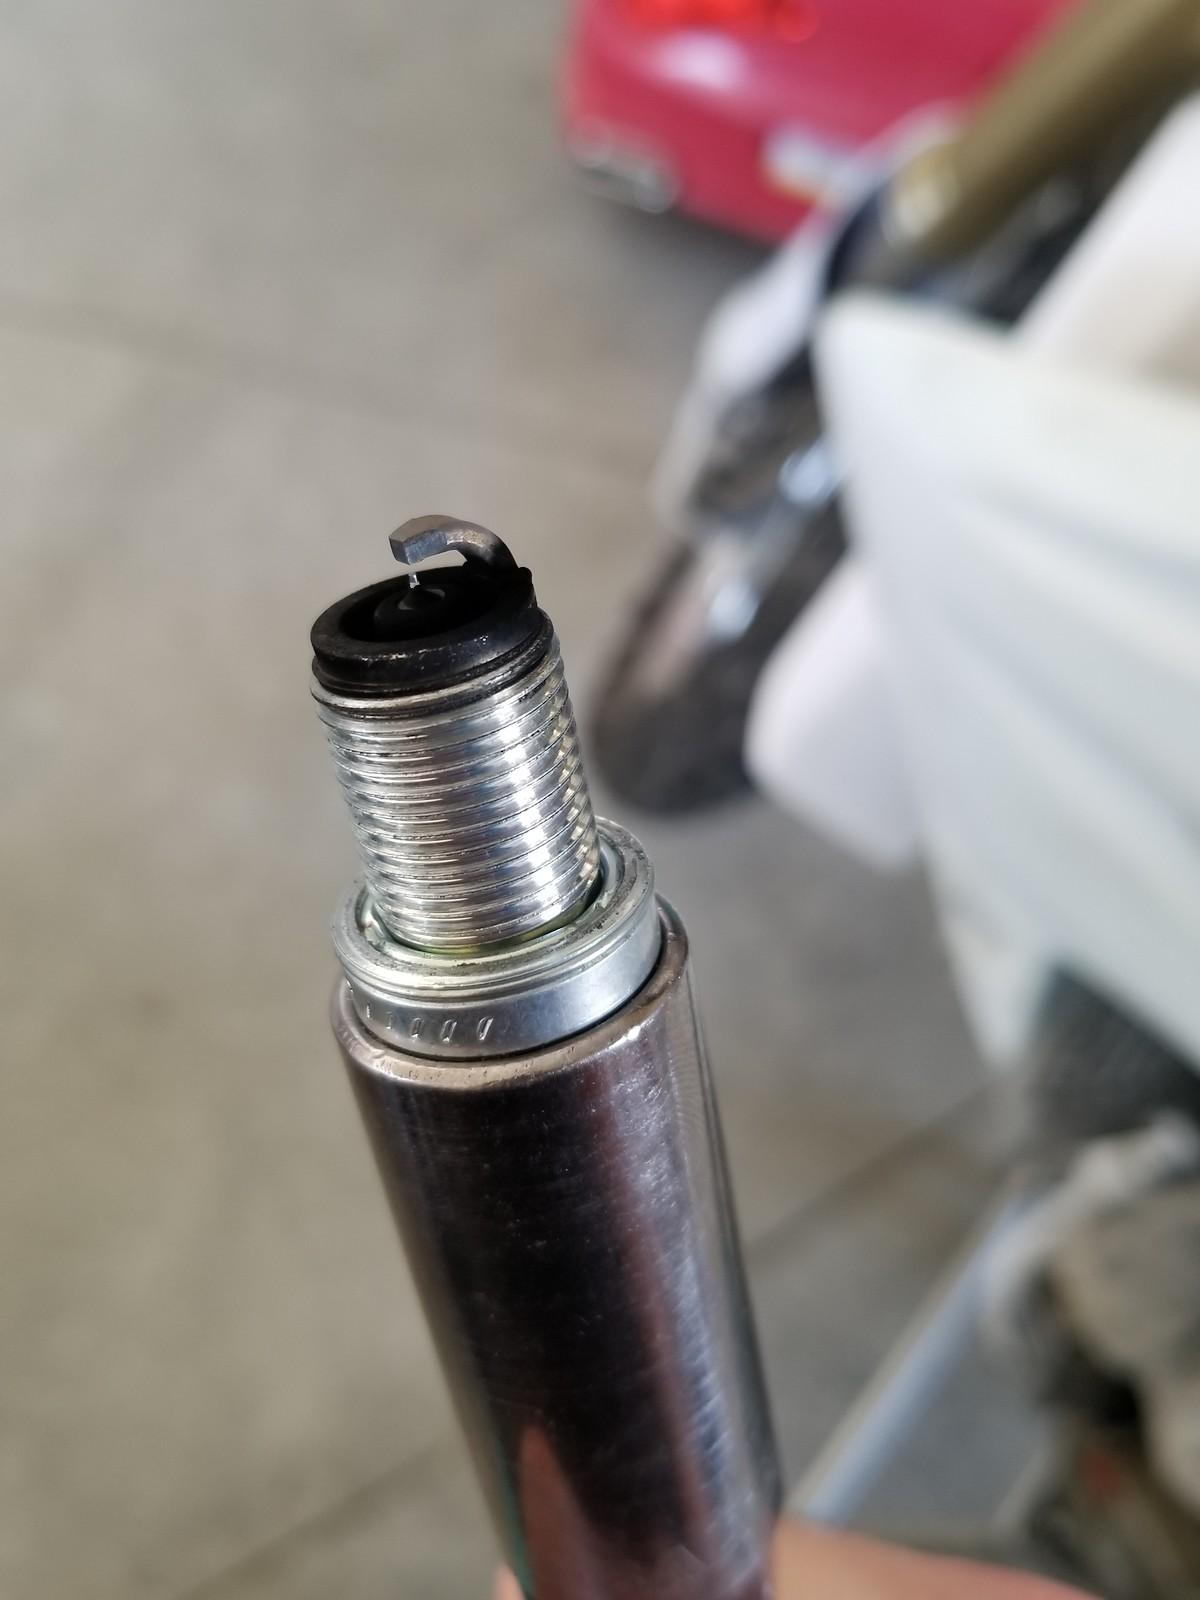 2006 Honda CRF450R Decel Popping - Tech Help/Race Shop